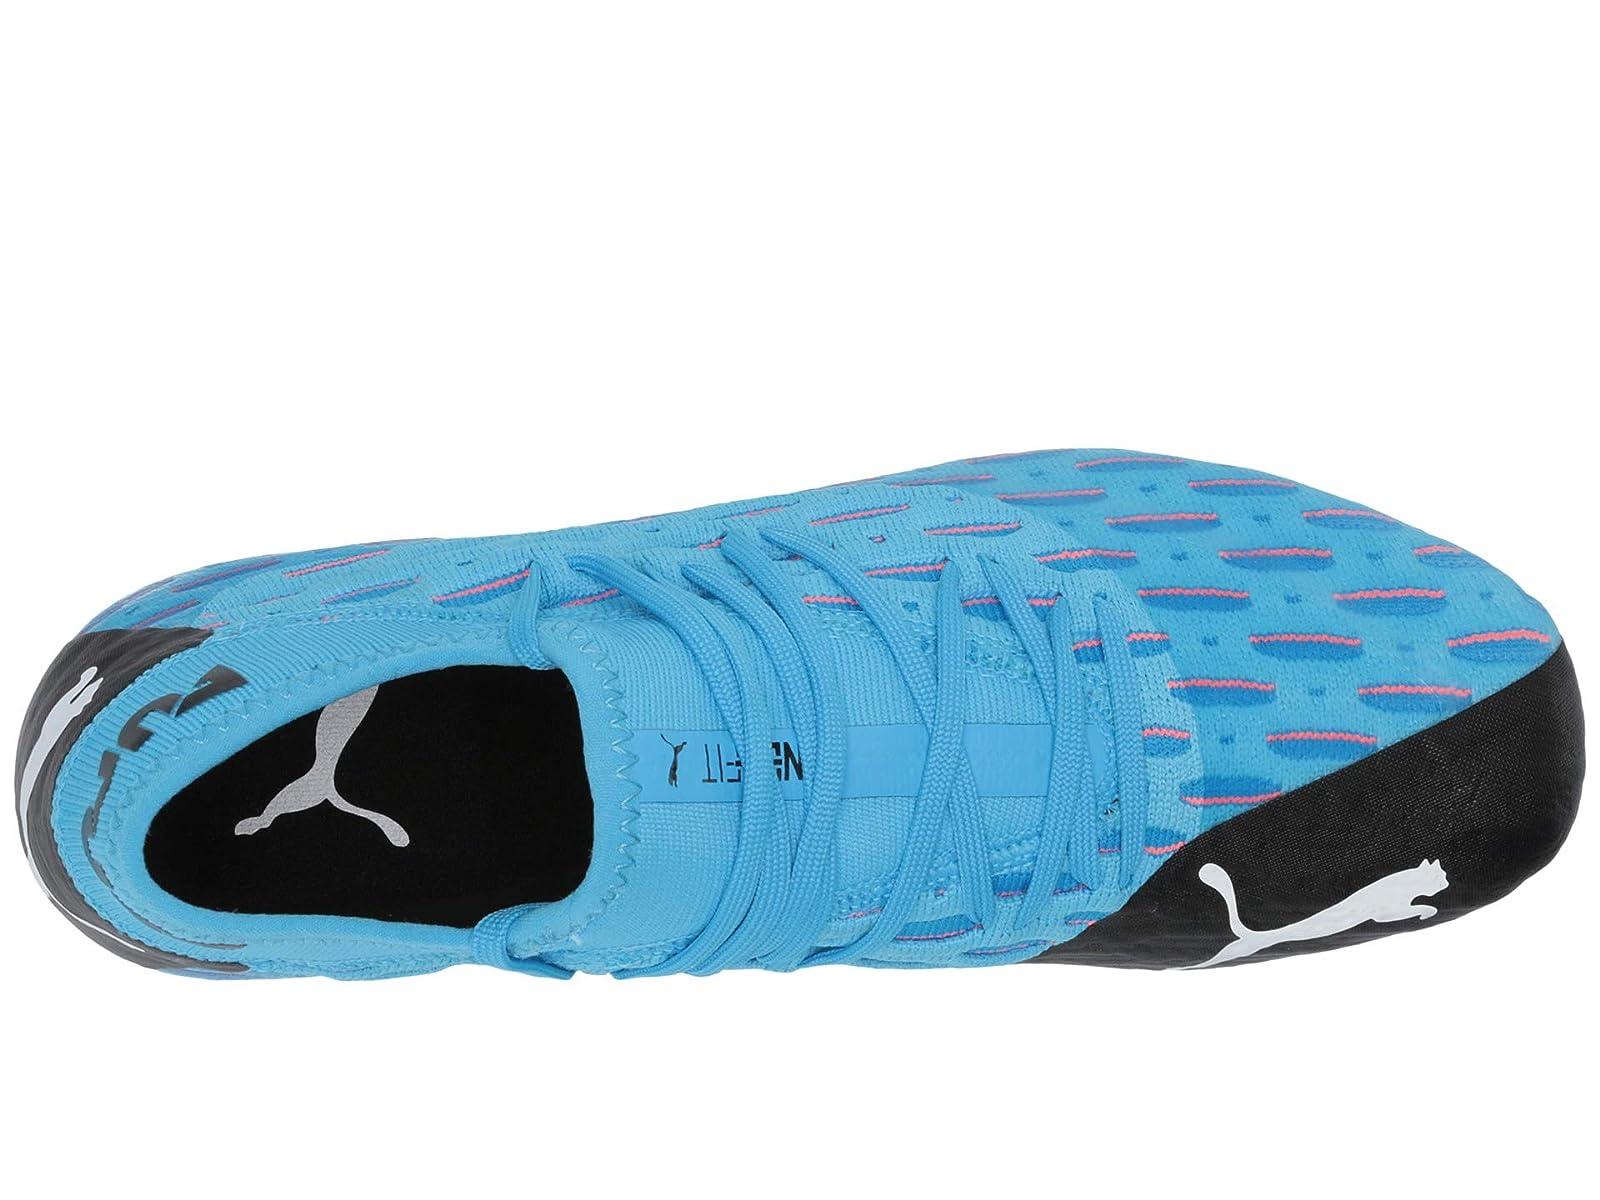 Man-039-s-Sneakers-amp-Athletic-Shoes-PUMA-Future-5-2-Netfit-FG-AG thumbnail 3